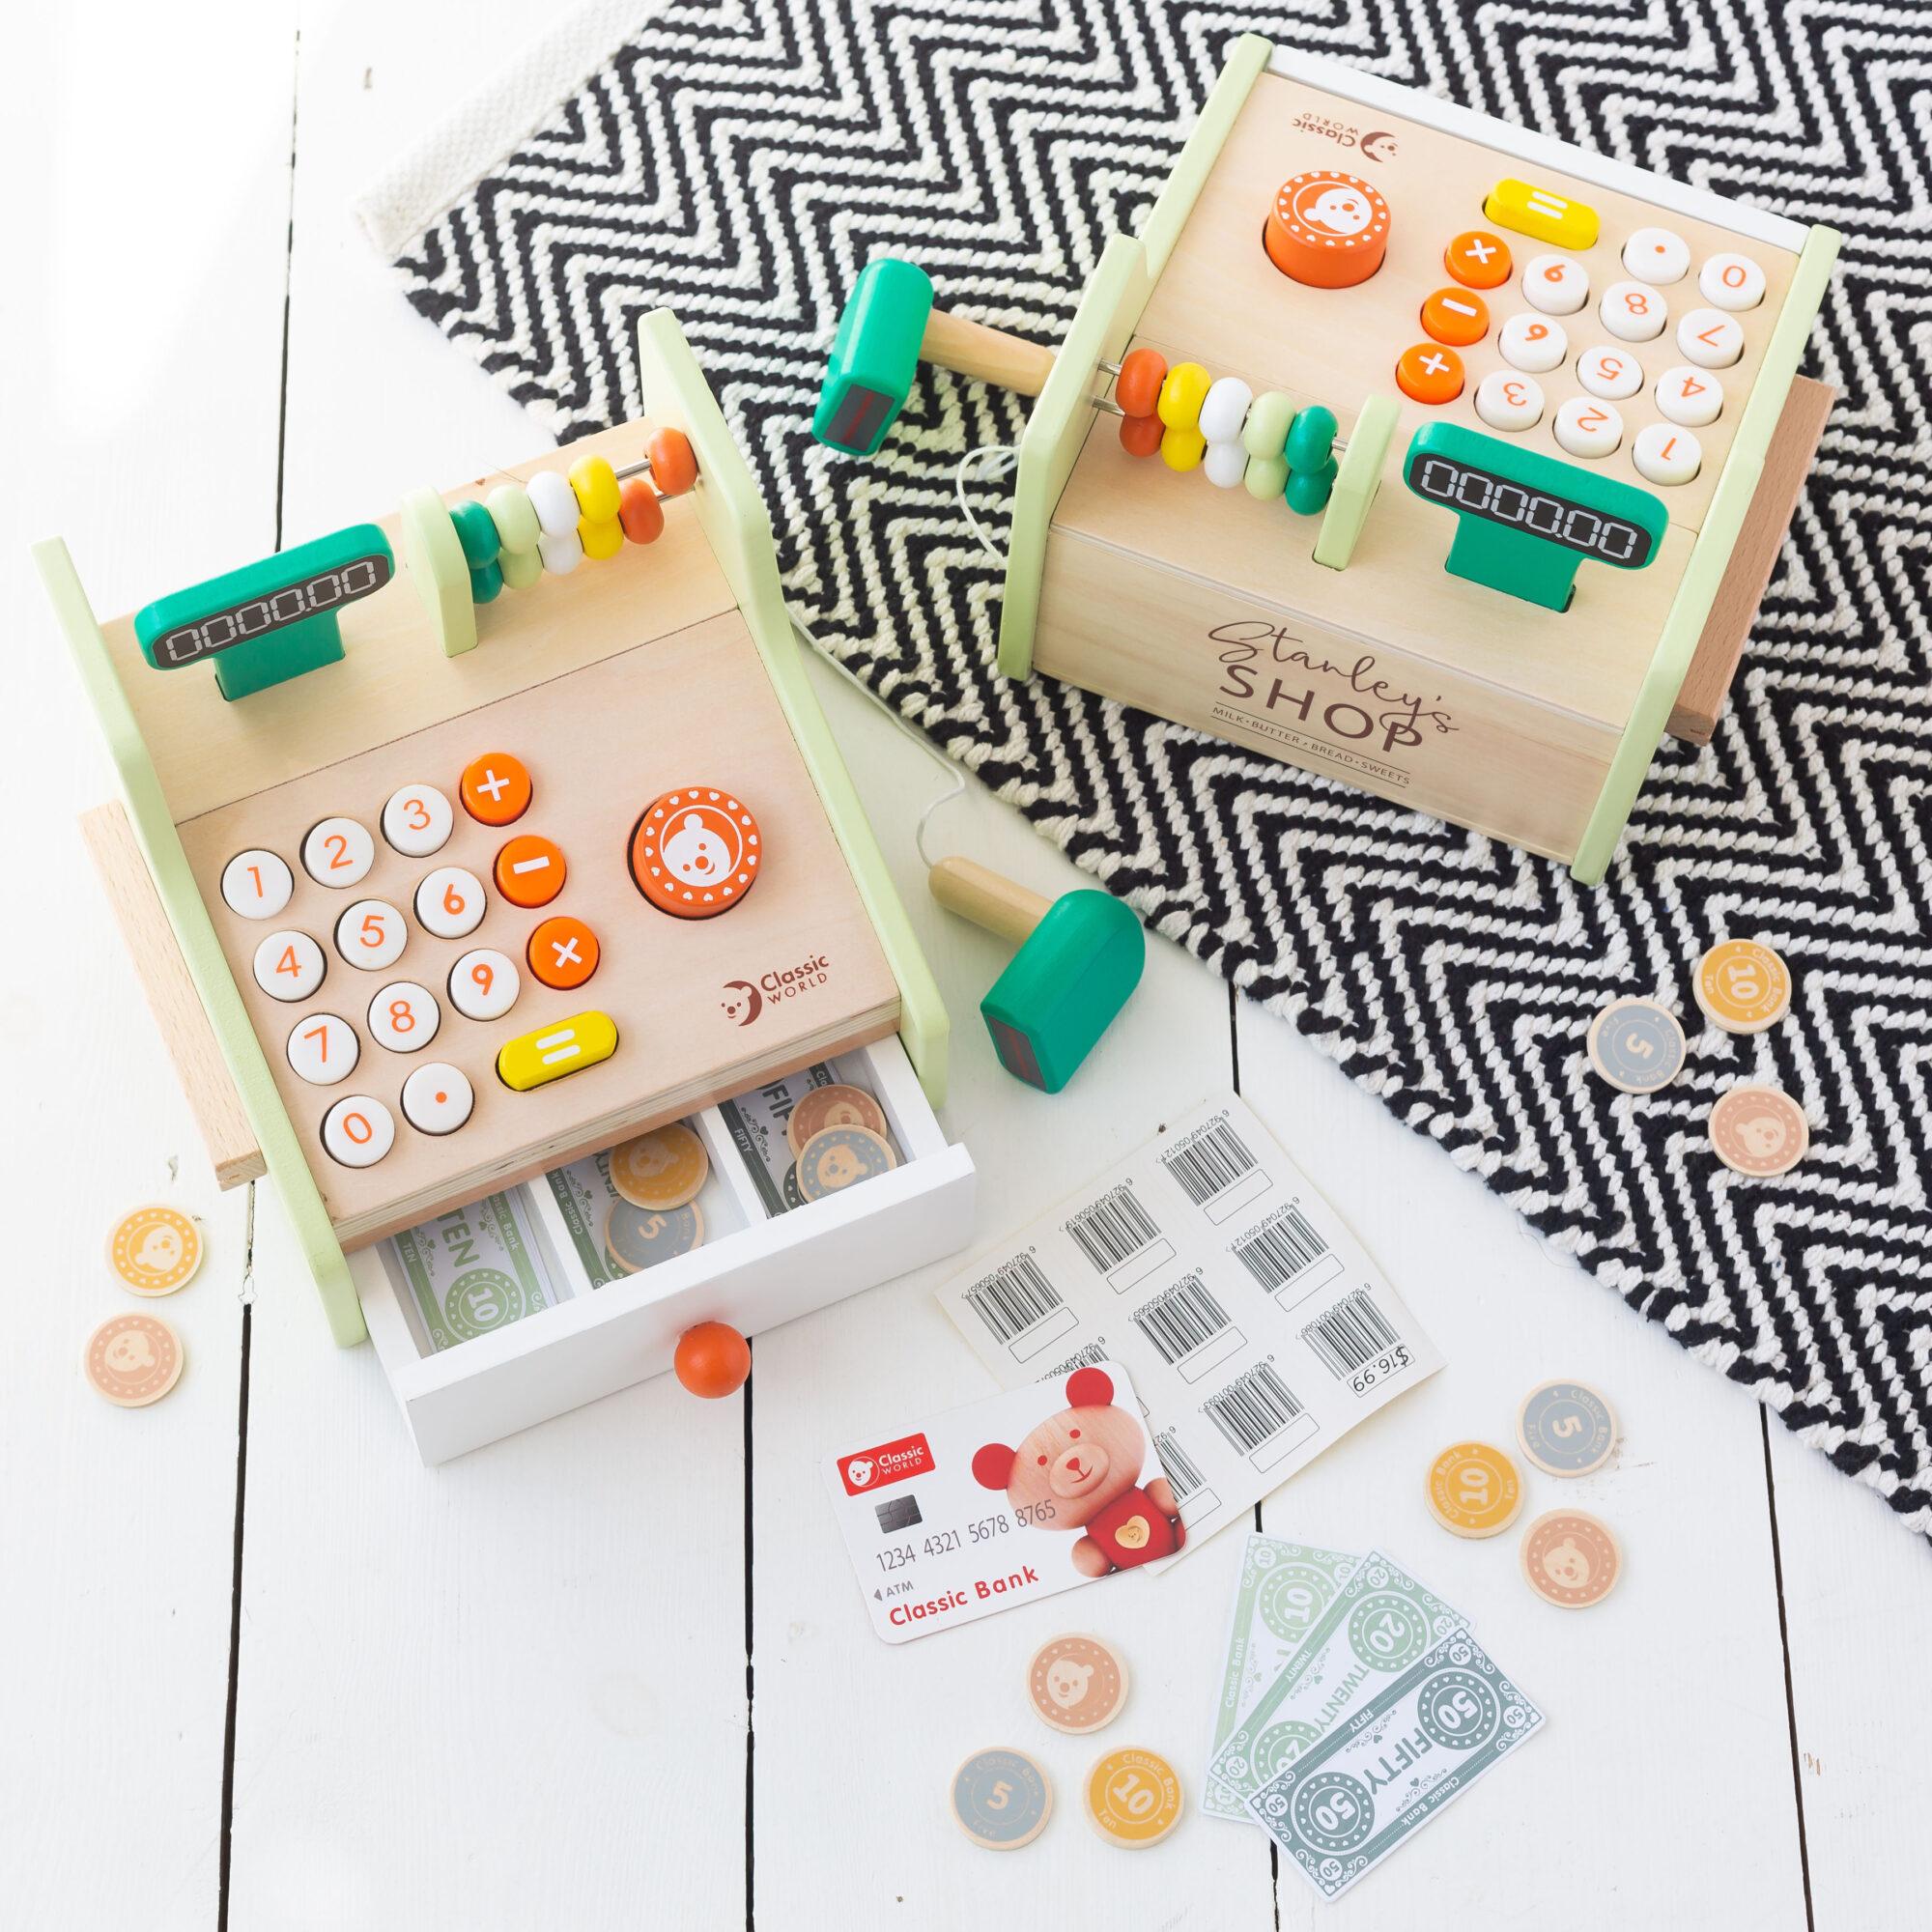 Personalised Kids Wooden Toy Till - Cash Register